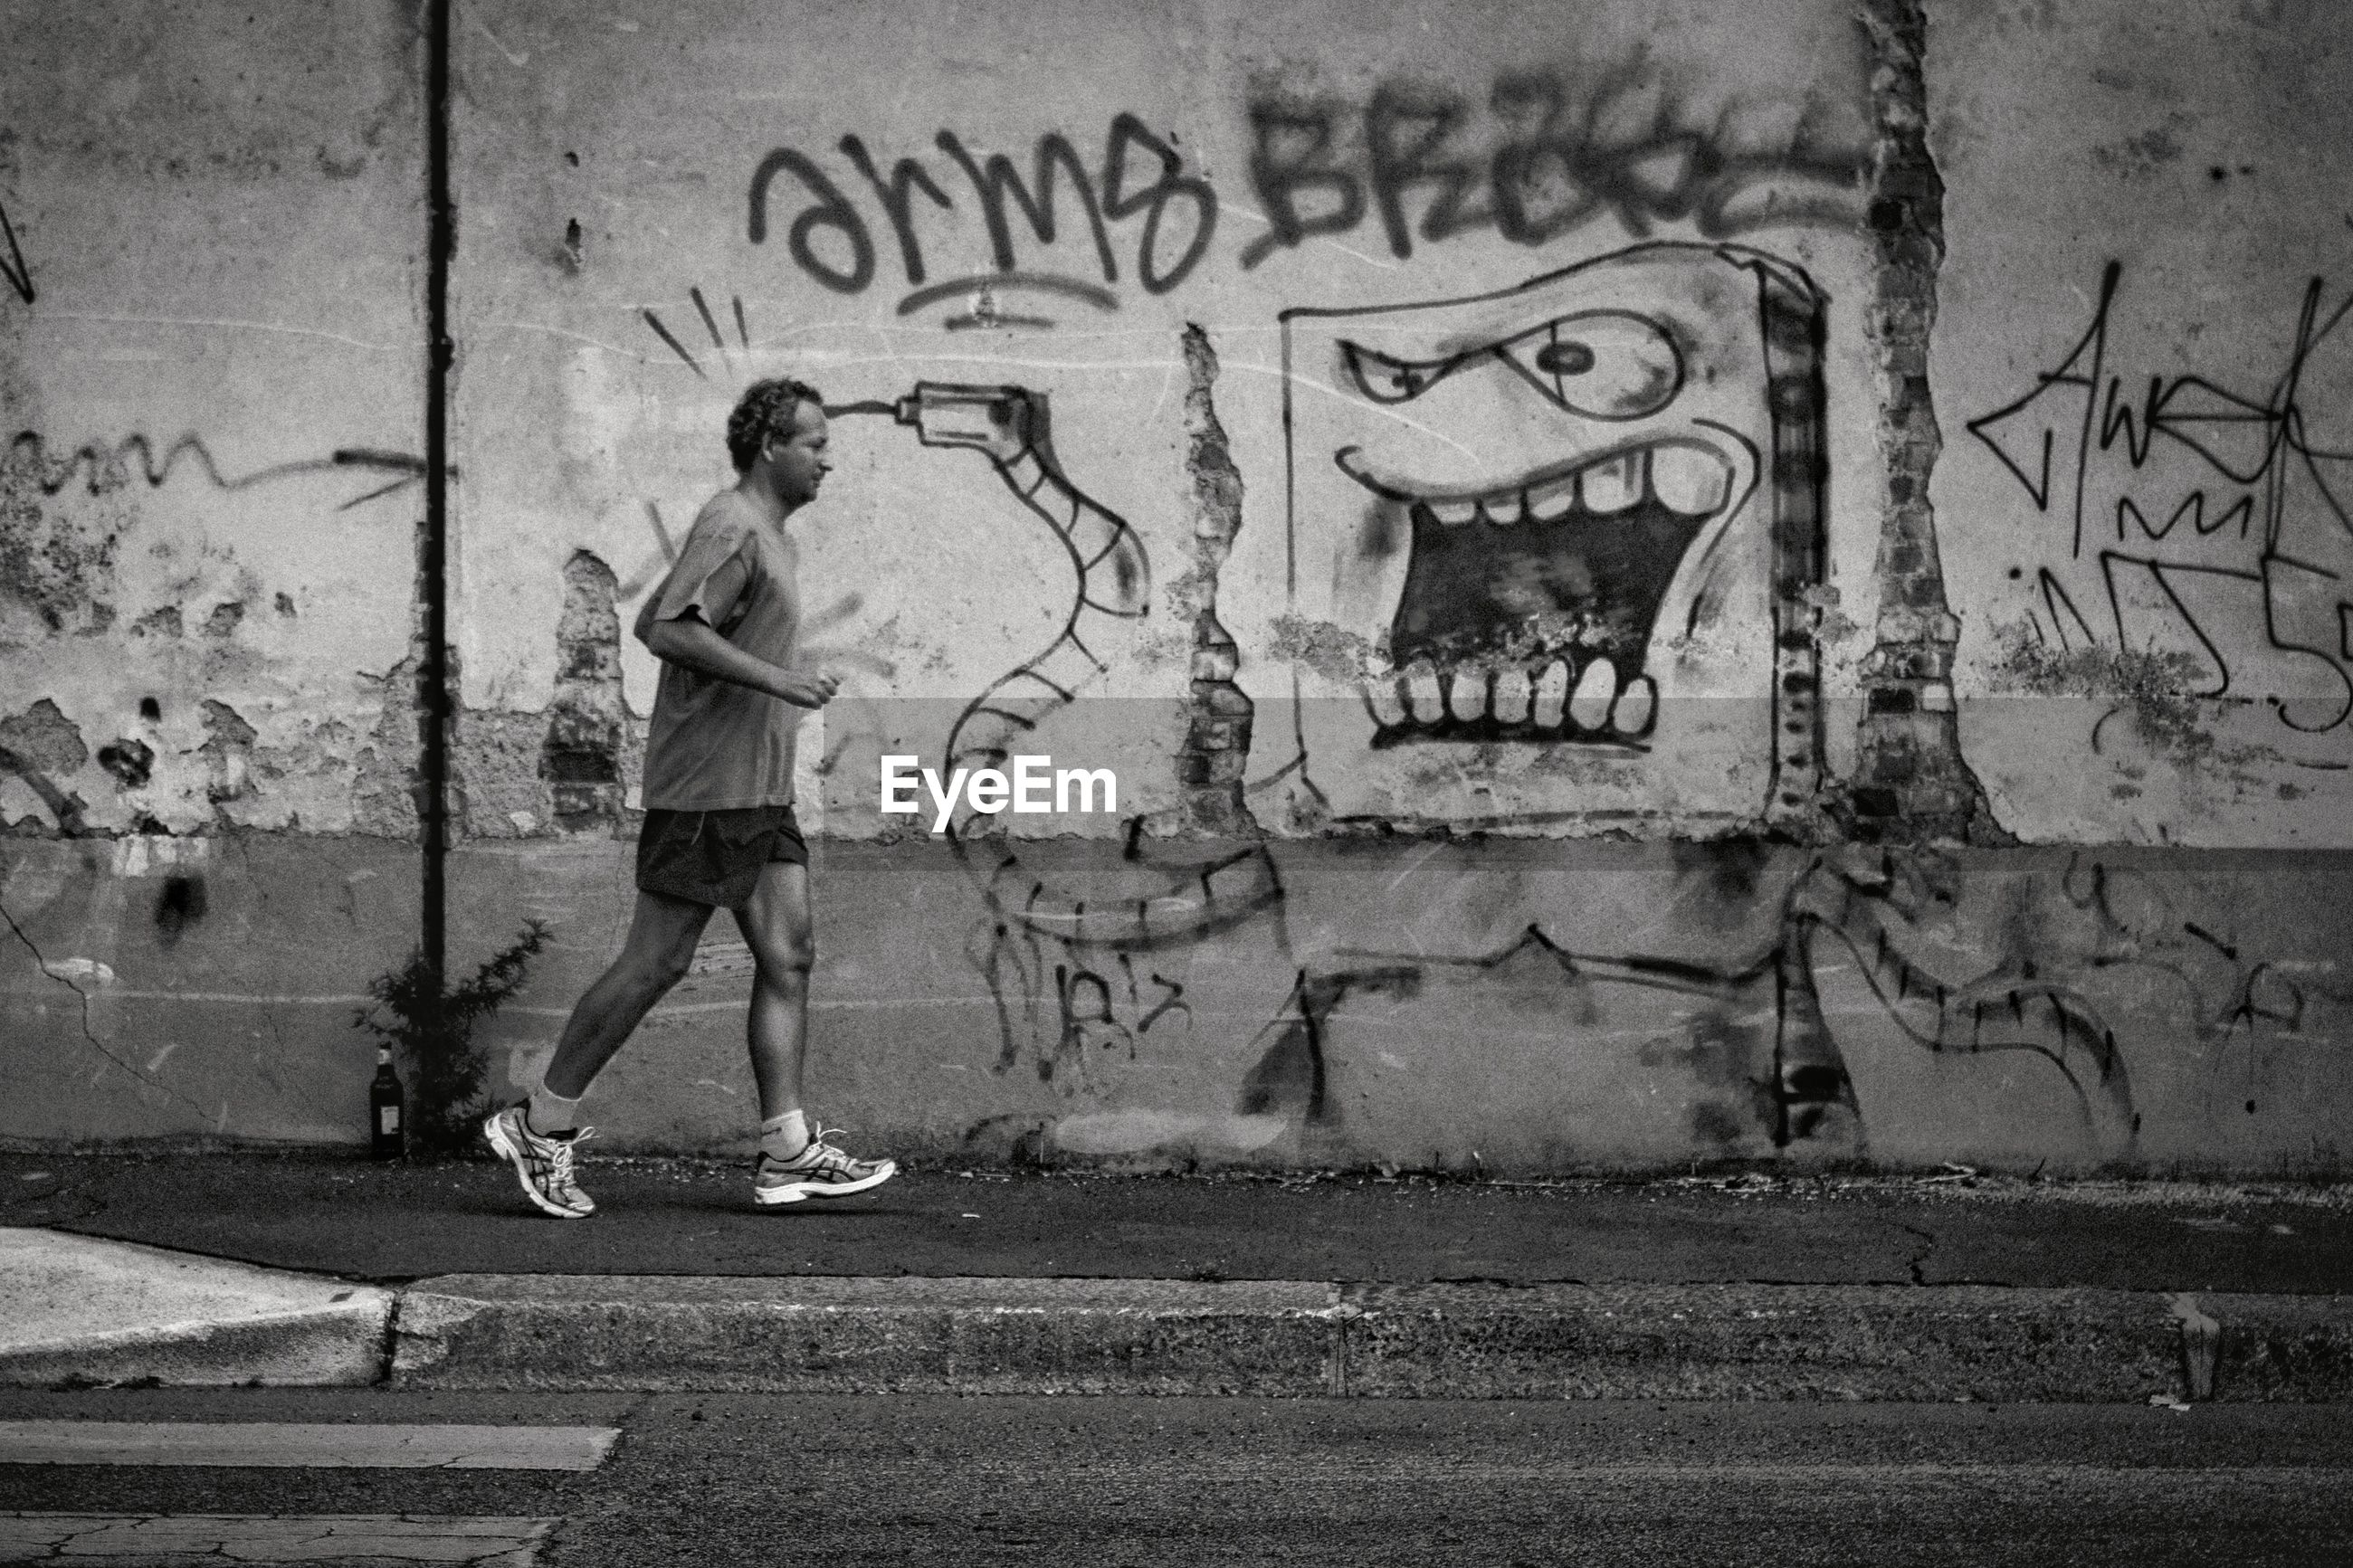 FULL LENGTH OF MAN WITH SKATEBOARD ON STREET